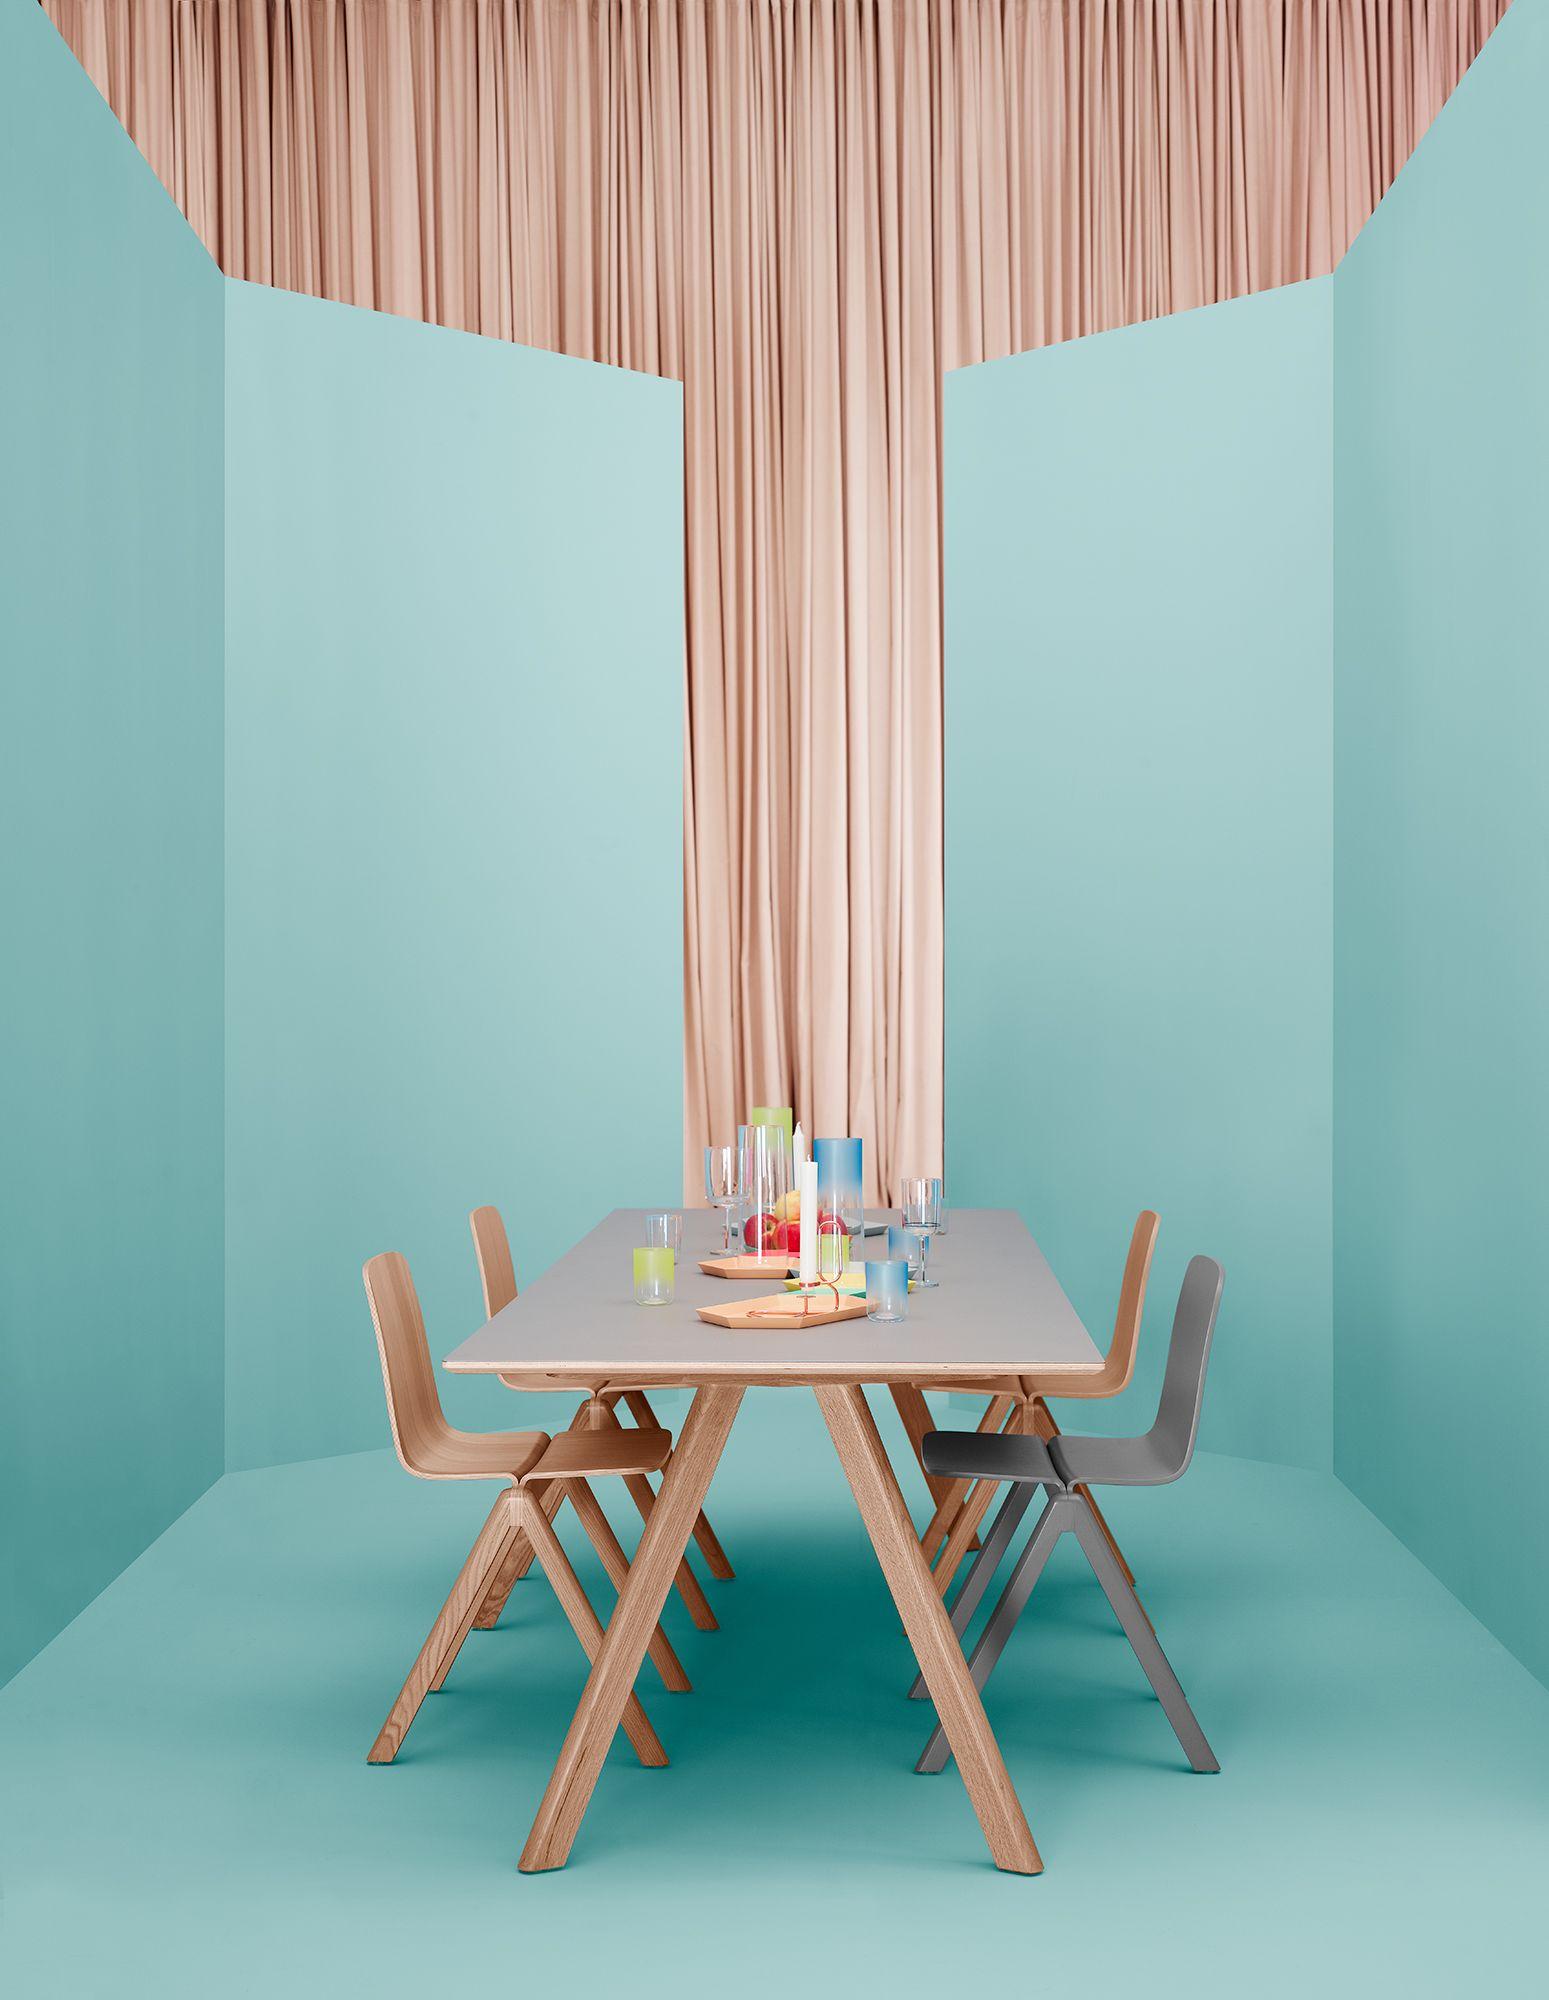 Chaise Copenhagen bois : chêne - HAY #design #home #interior #furniture #assise #siège #decoration #amenagement #wood #bouroulec